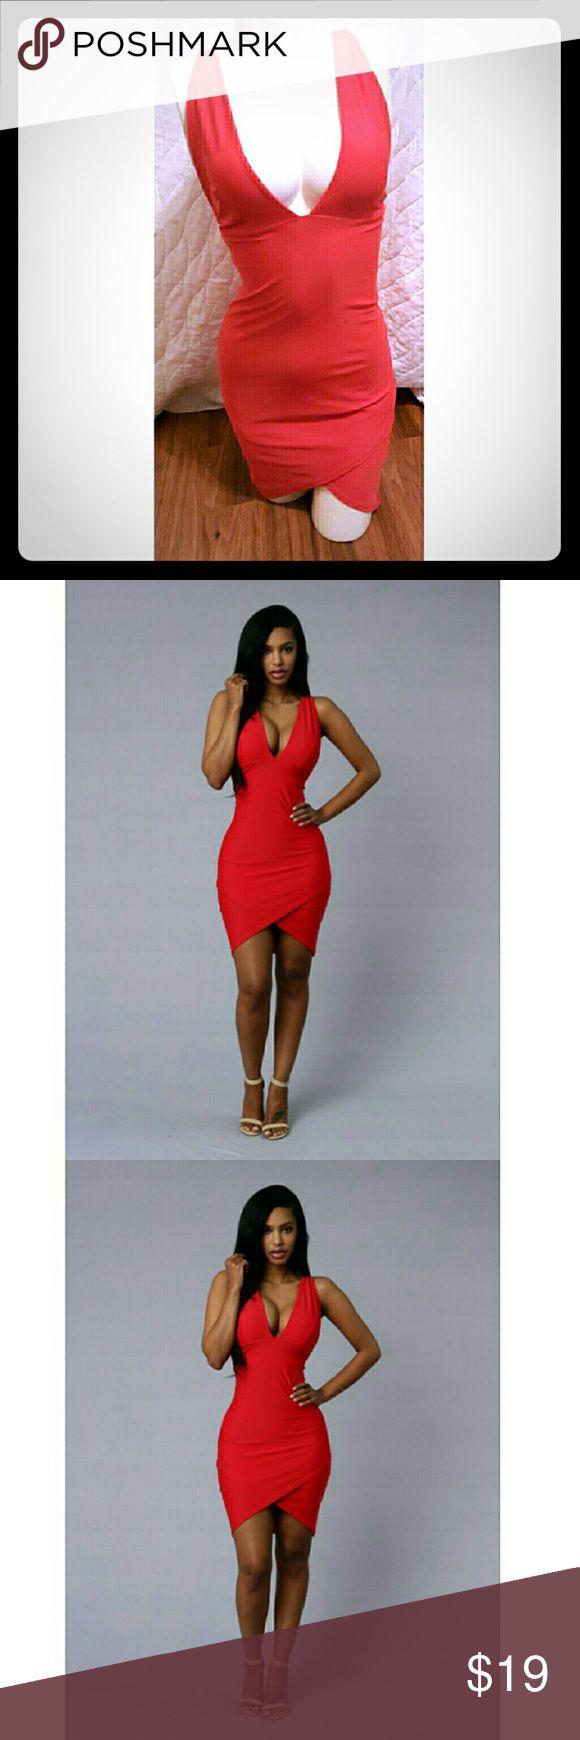 Red dress☆ミ ☆彡 Red dress nwot red body con stretch club party dress Dresses Midi